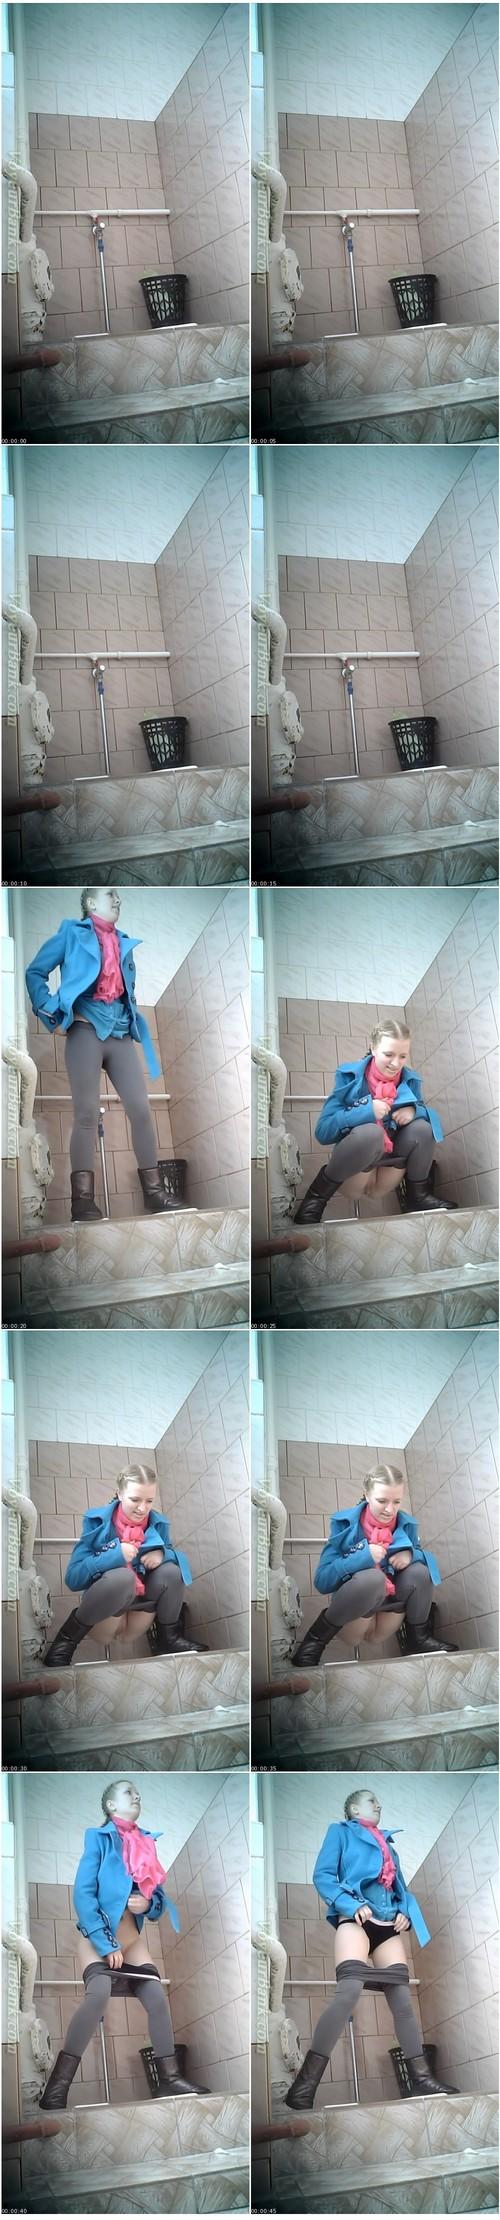 http://ist5-1.filesor.com/pimpandhost.com/9/6/8/3/96838/6/j/f/C/6jfCB/VoyeurBank0530_thumb_m.jpg